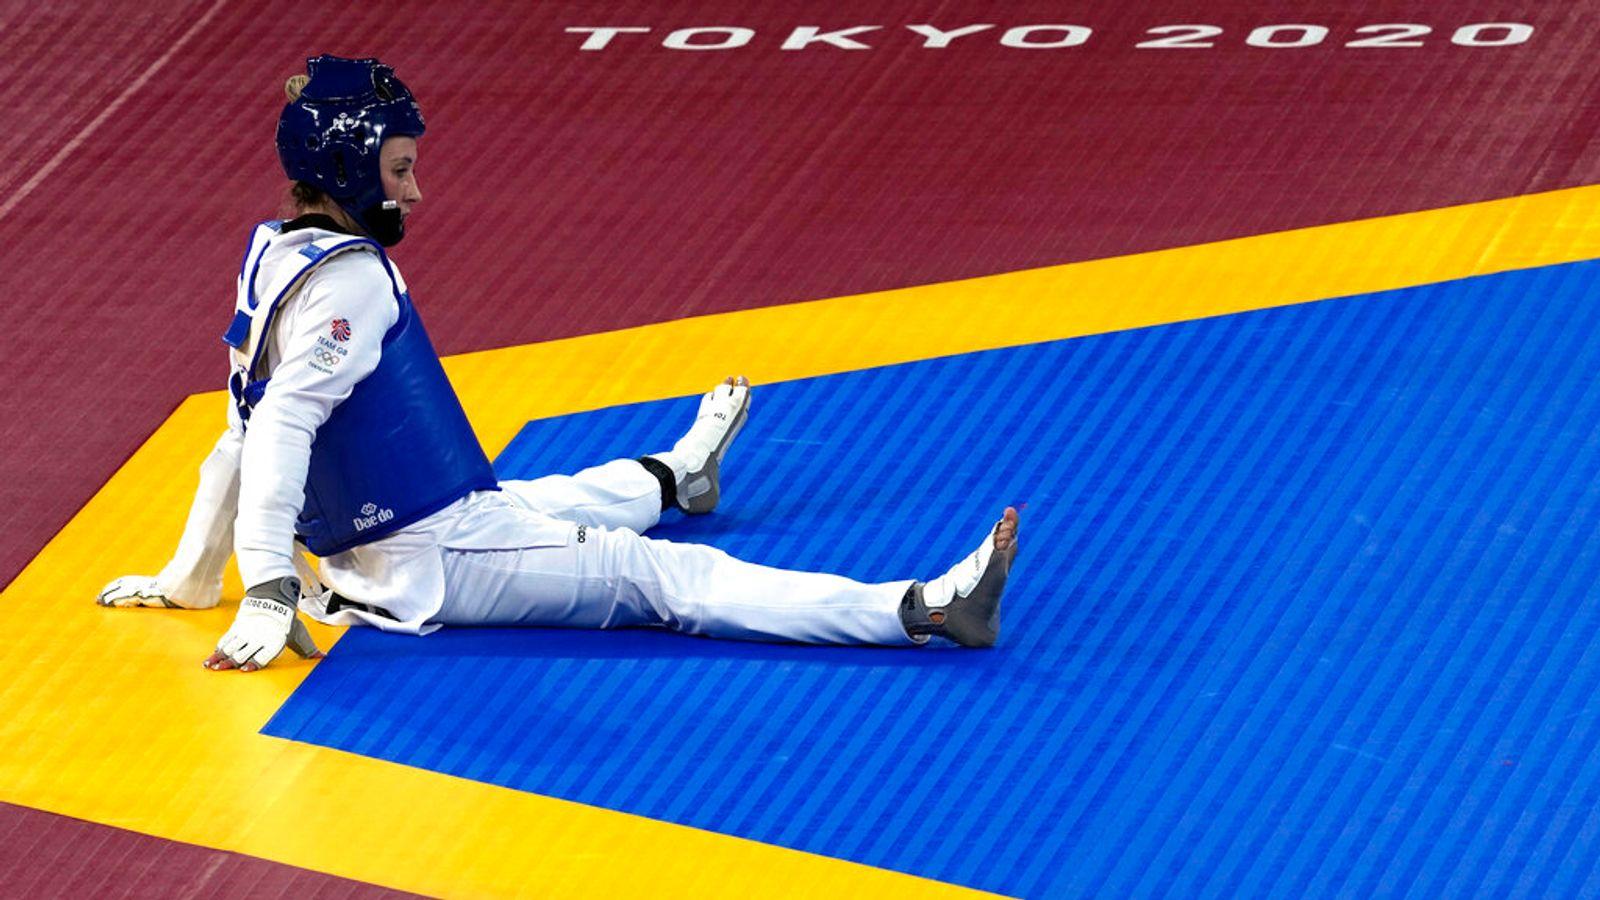 Tokyo Olympics: Jade Jones shock defeat in taekwondo as Andy Murray pulls out of tennis singles